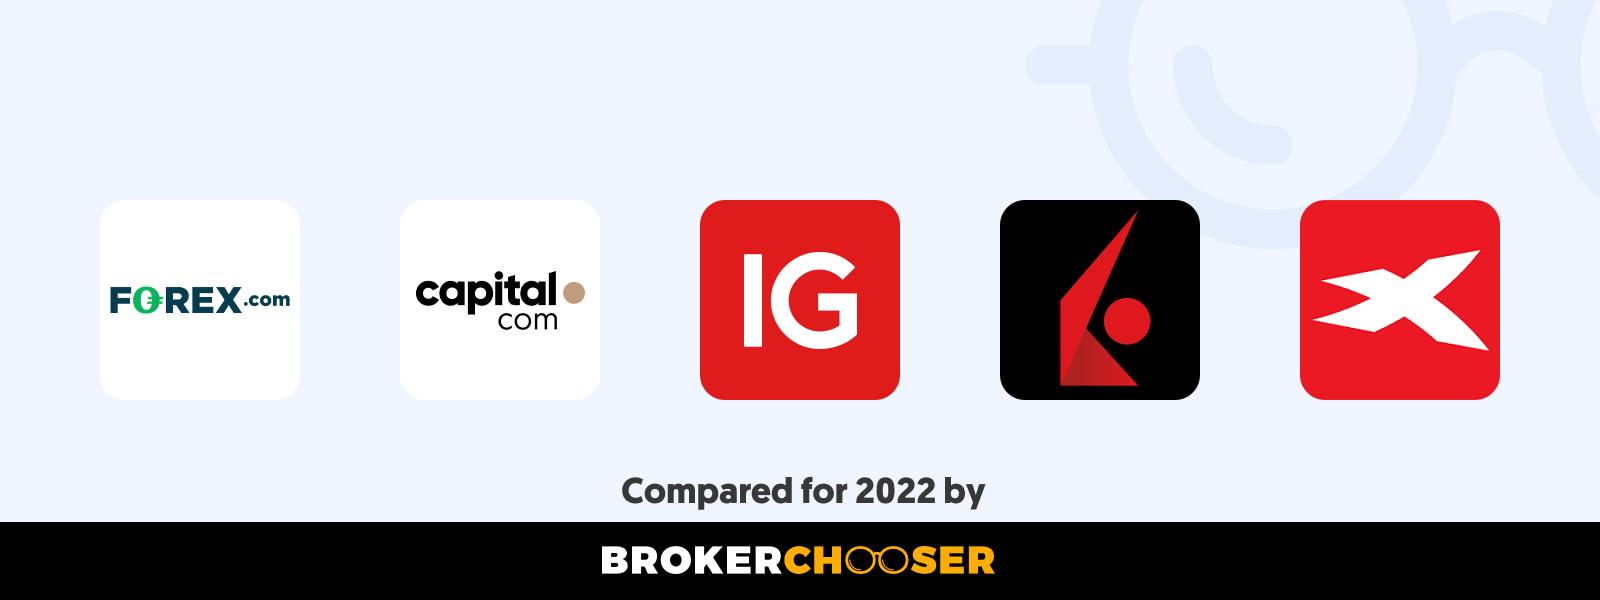 Best forex brokers for beginners in Gabon in 2021